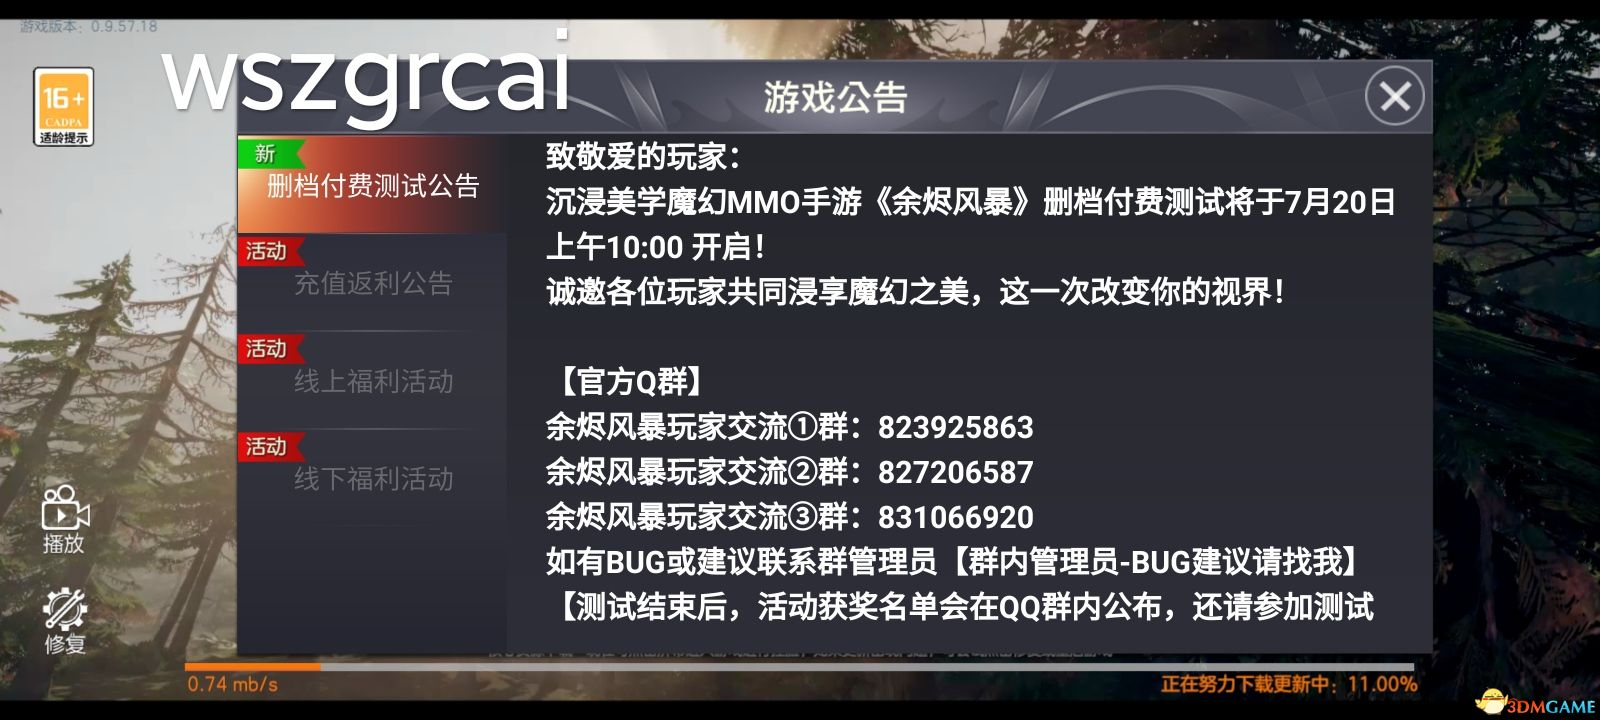 IMG_20210719_130107.jpg